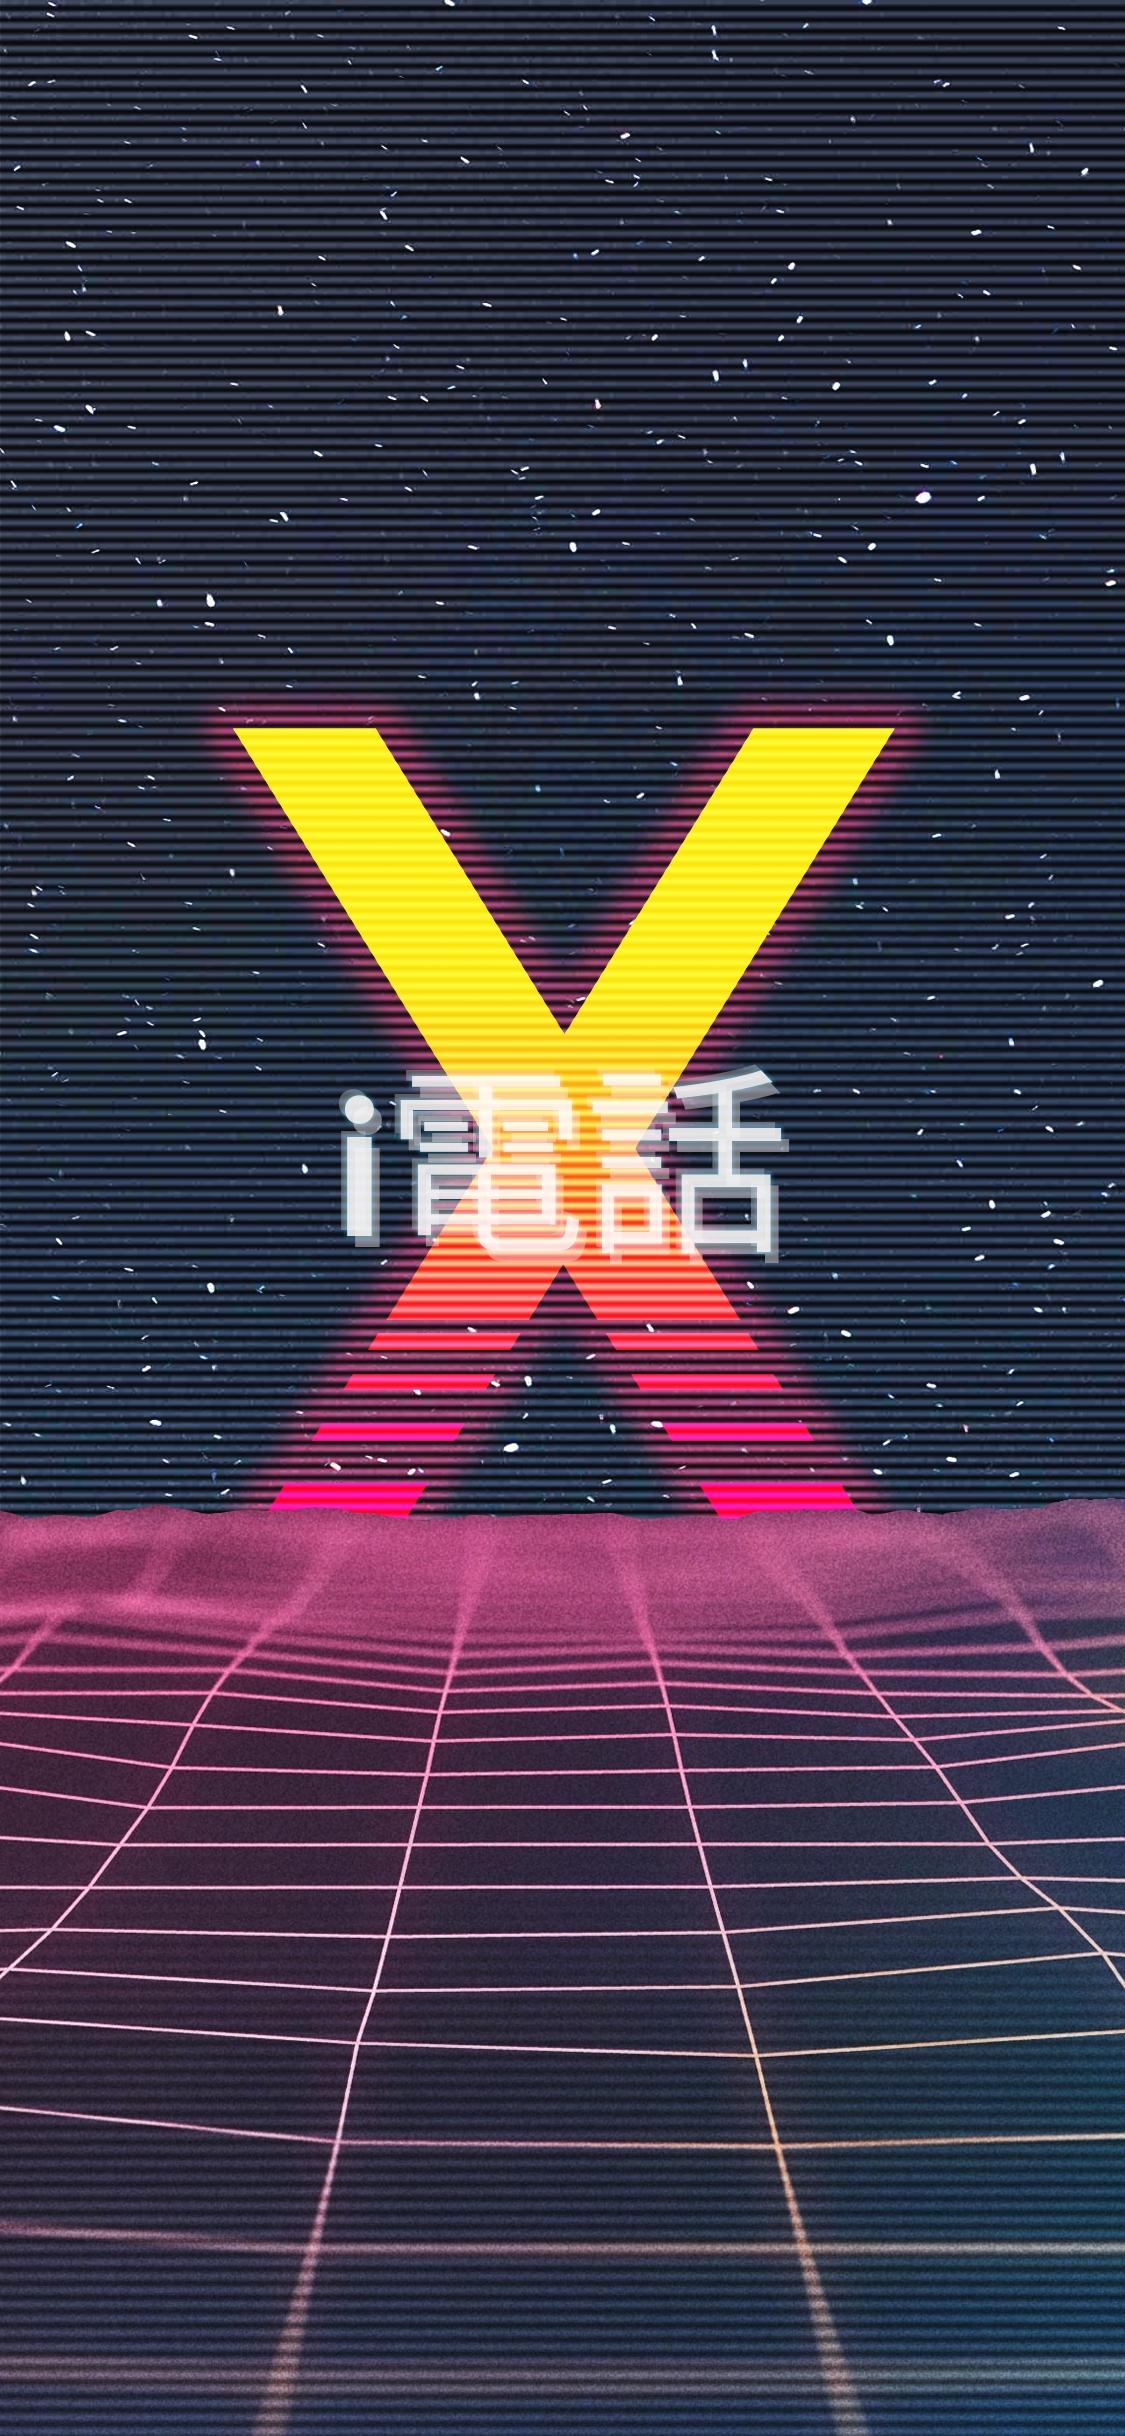 Retrowave Wallpaper Iphone X